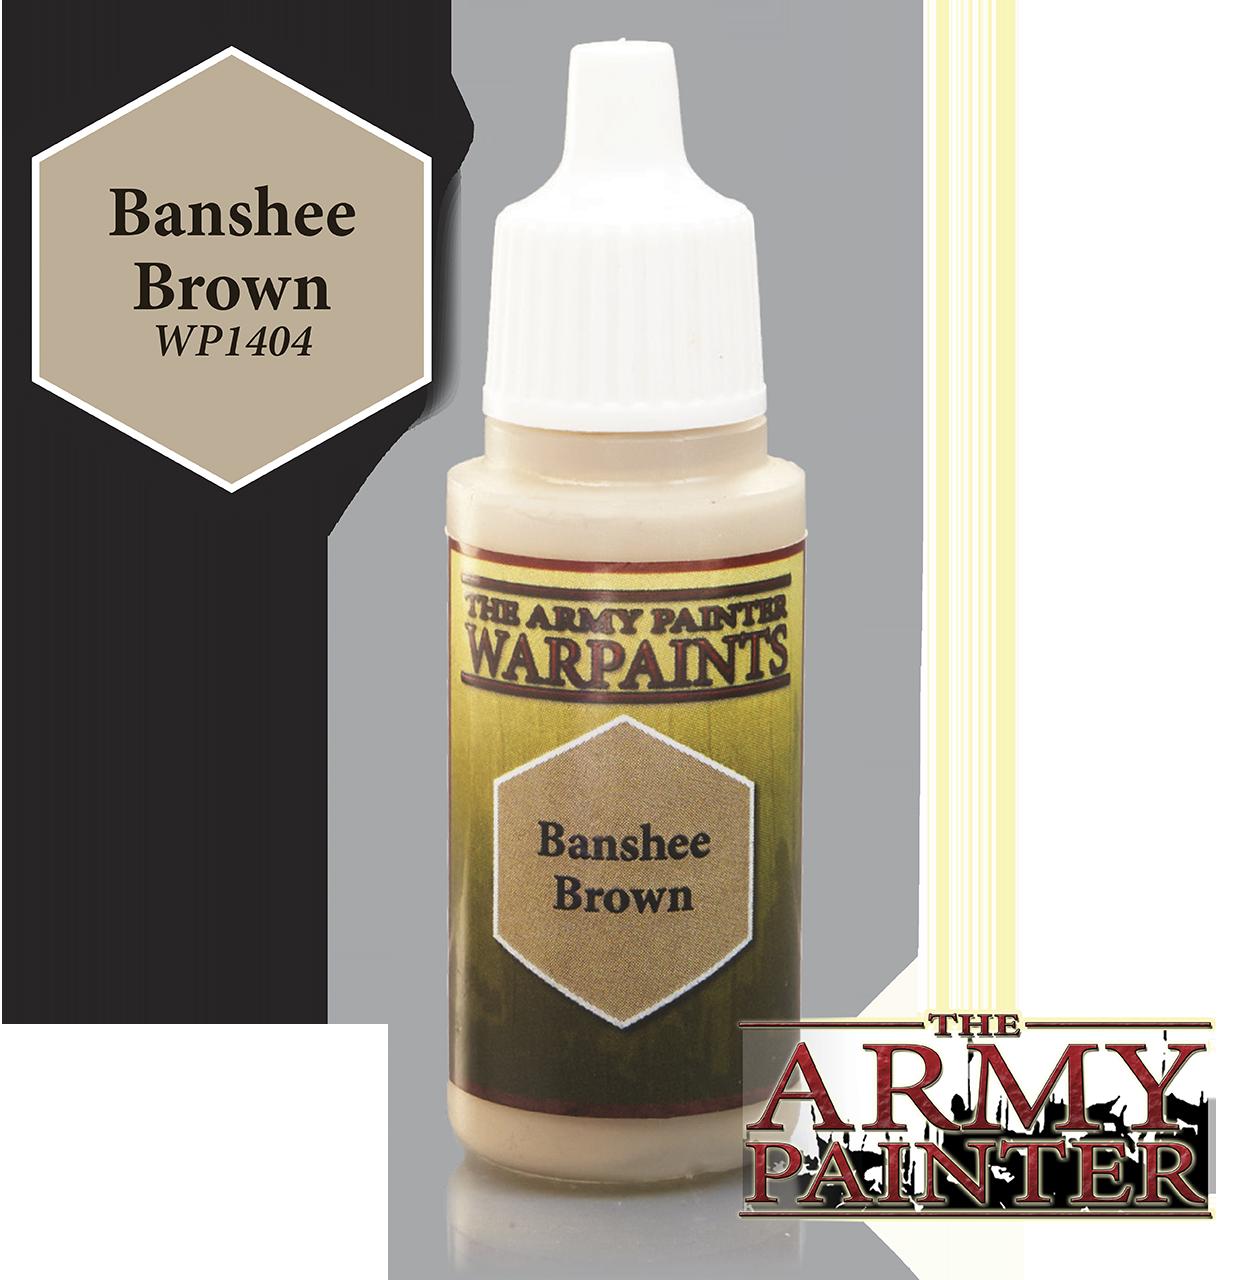 Banshee Brown - Army Painter Warpaints WP1404